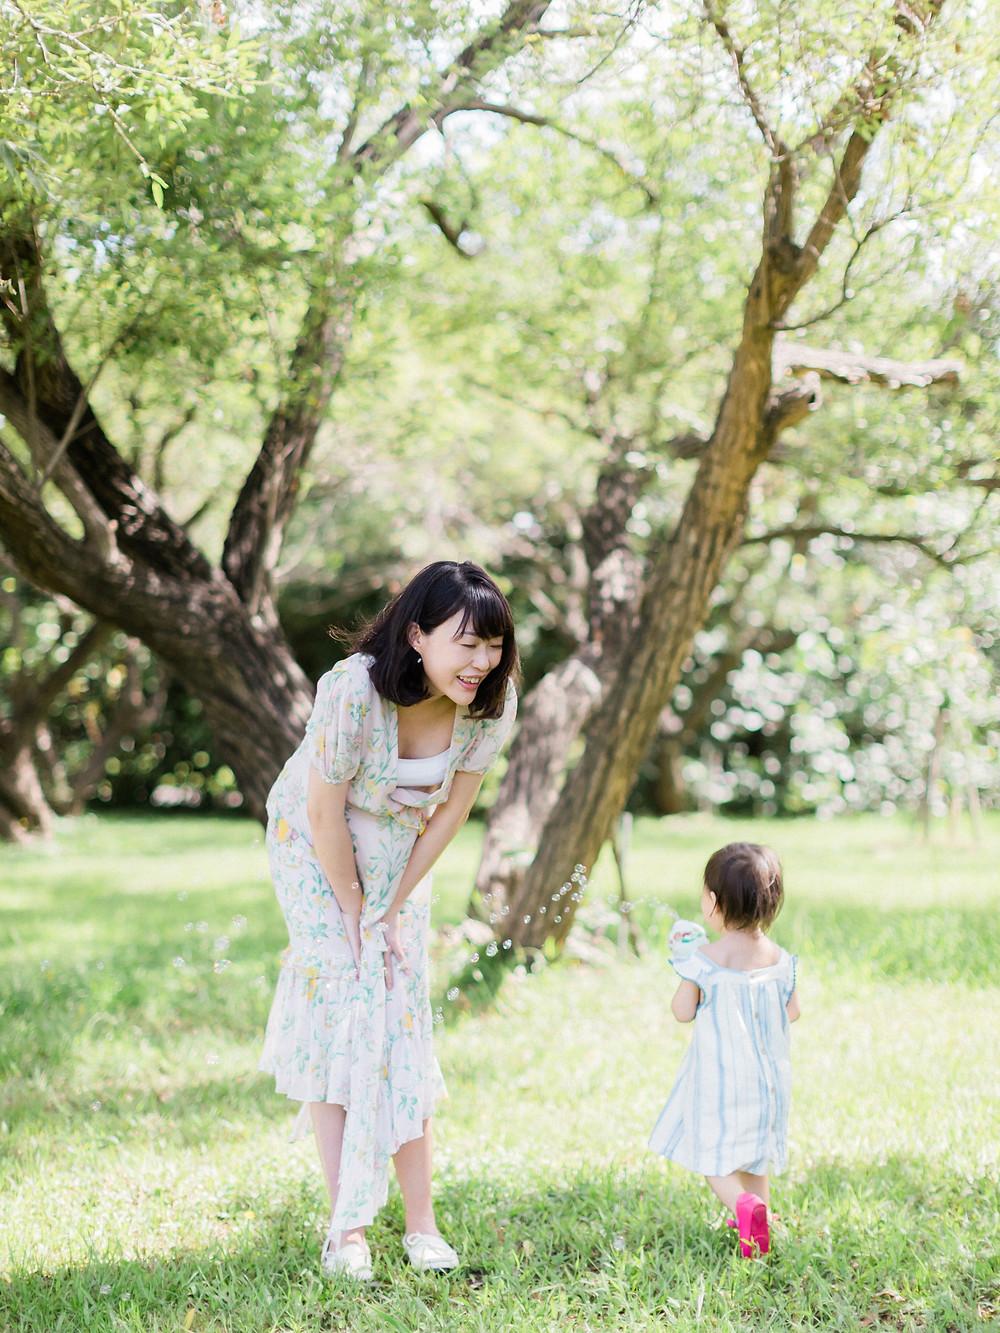 Emi & Mingchih Maternity Family Portrait 孕期家庭寫真 Arther Chen Photography